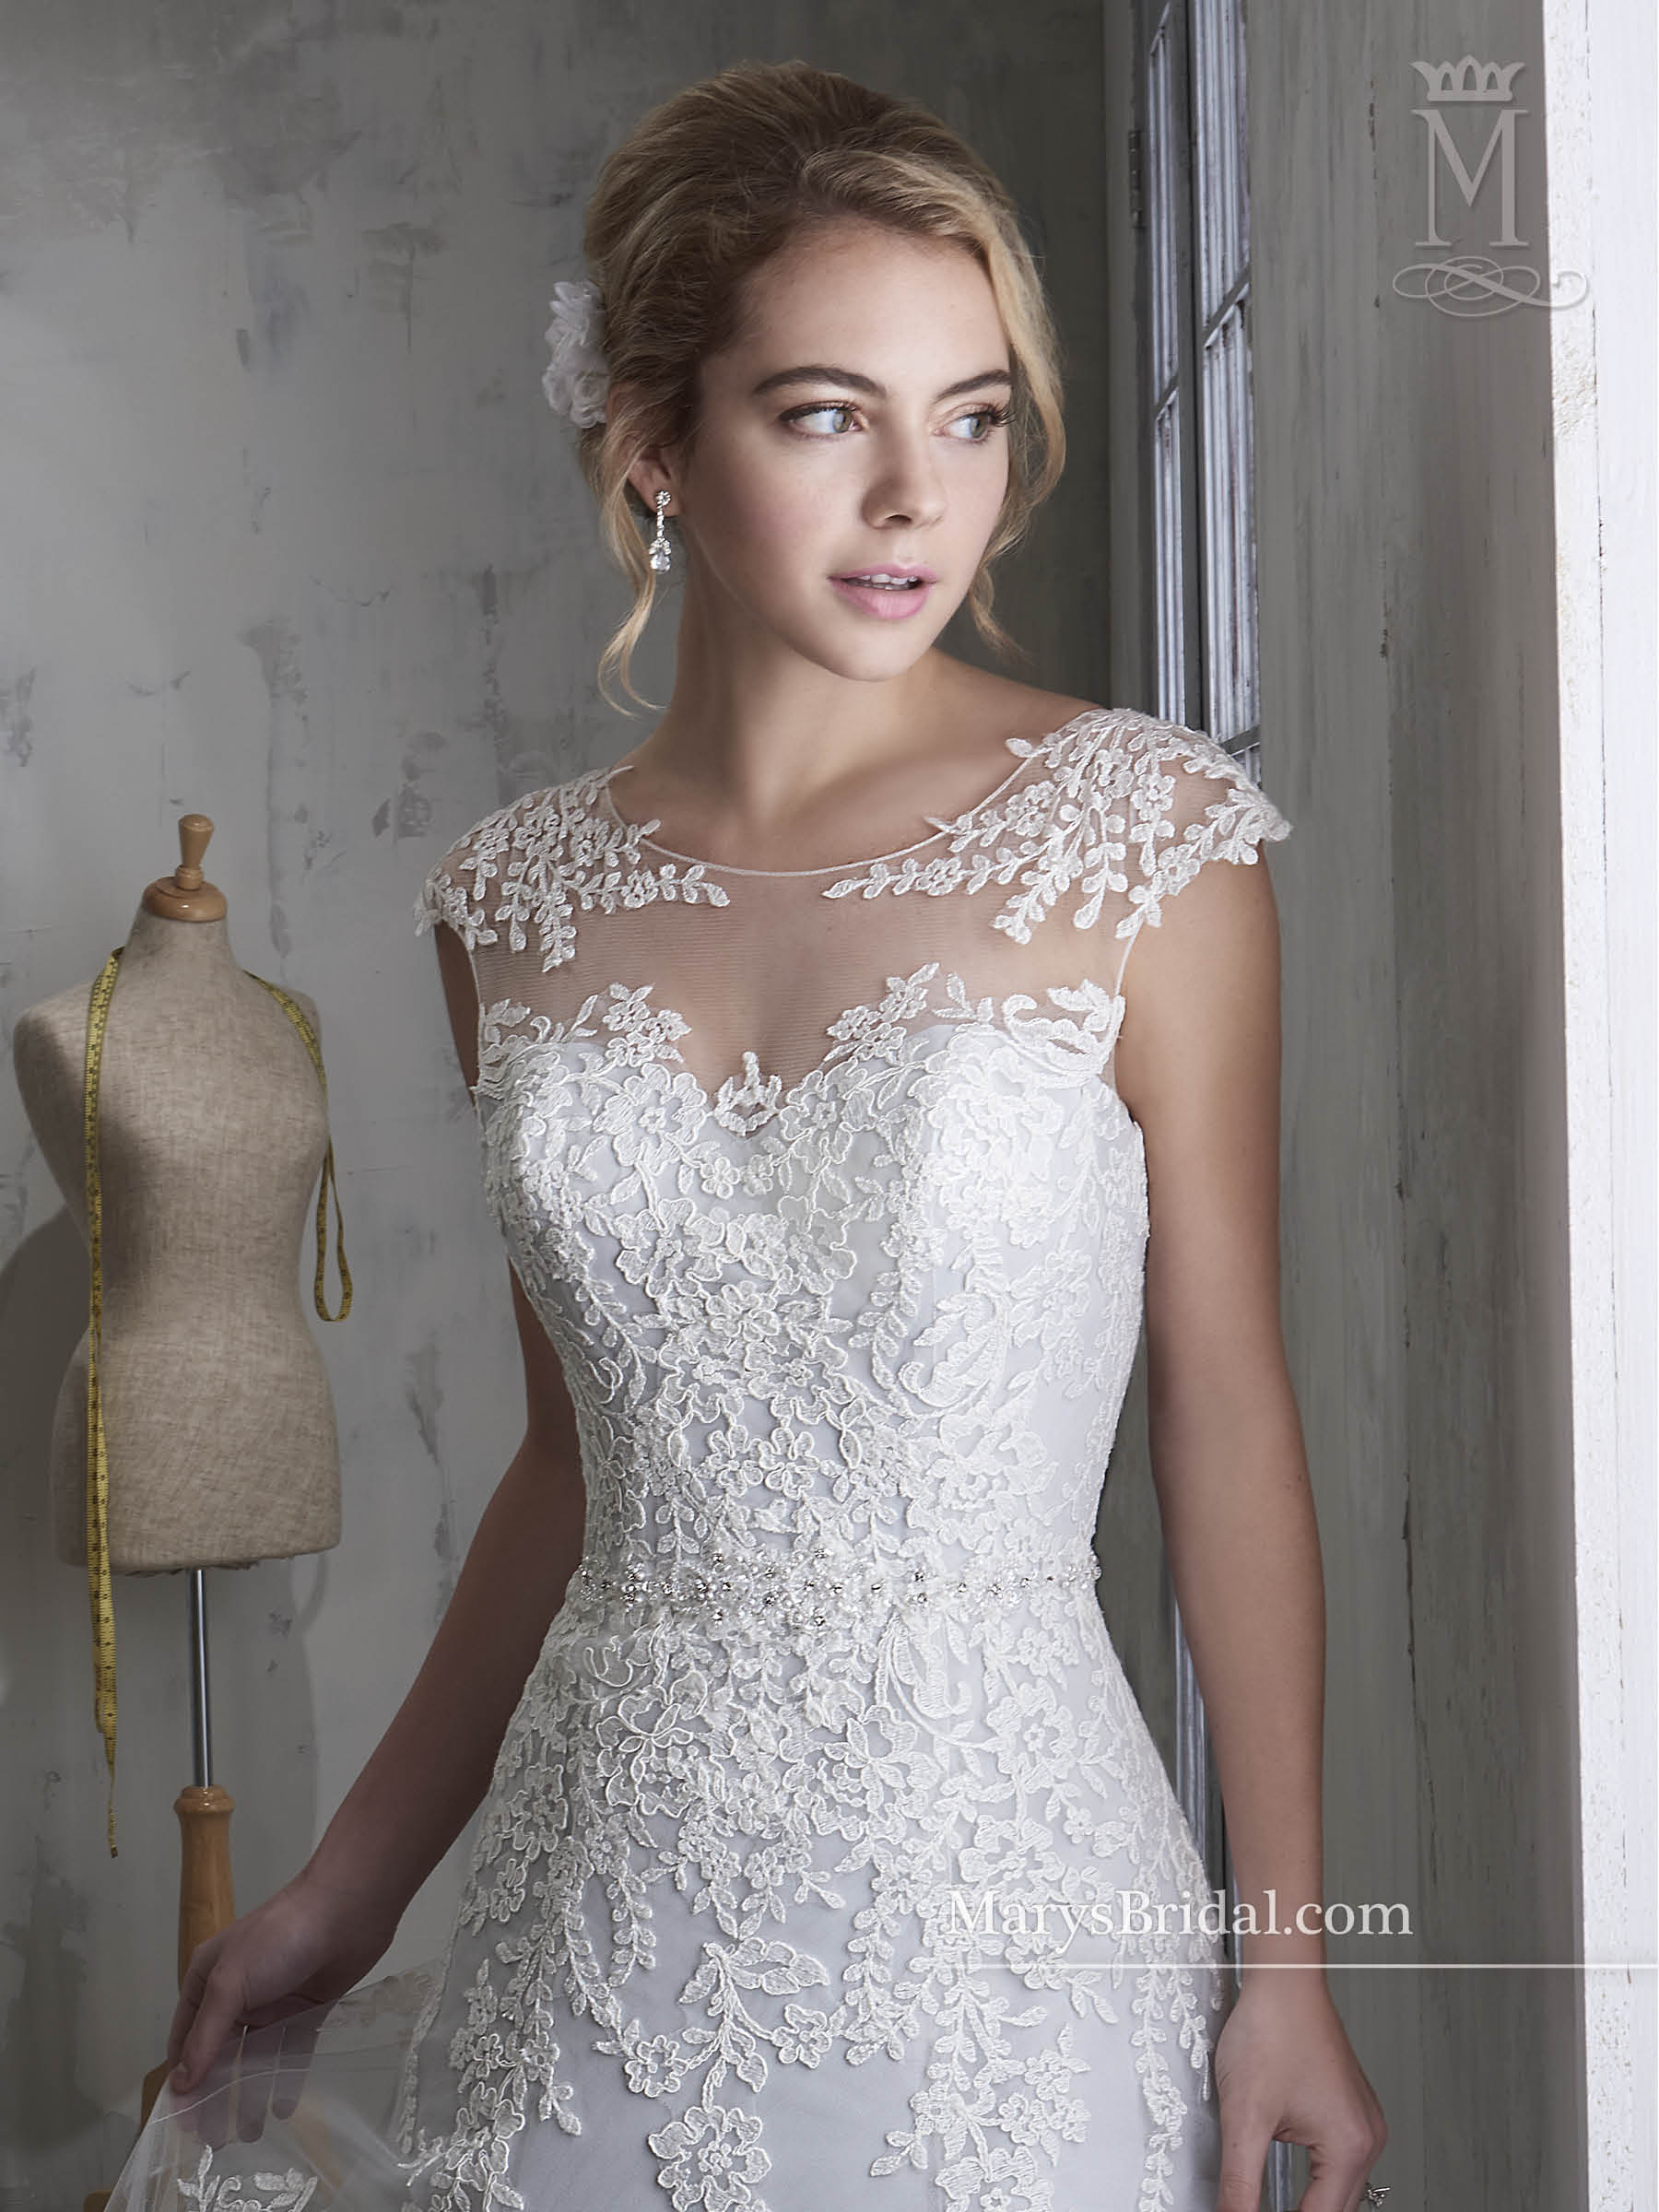 Bridal Wedding Dresses | Mary's | Style - 6593